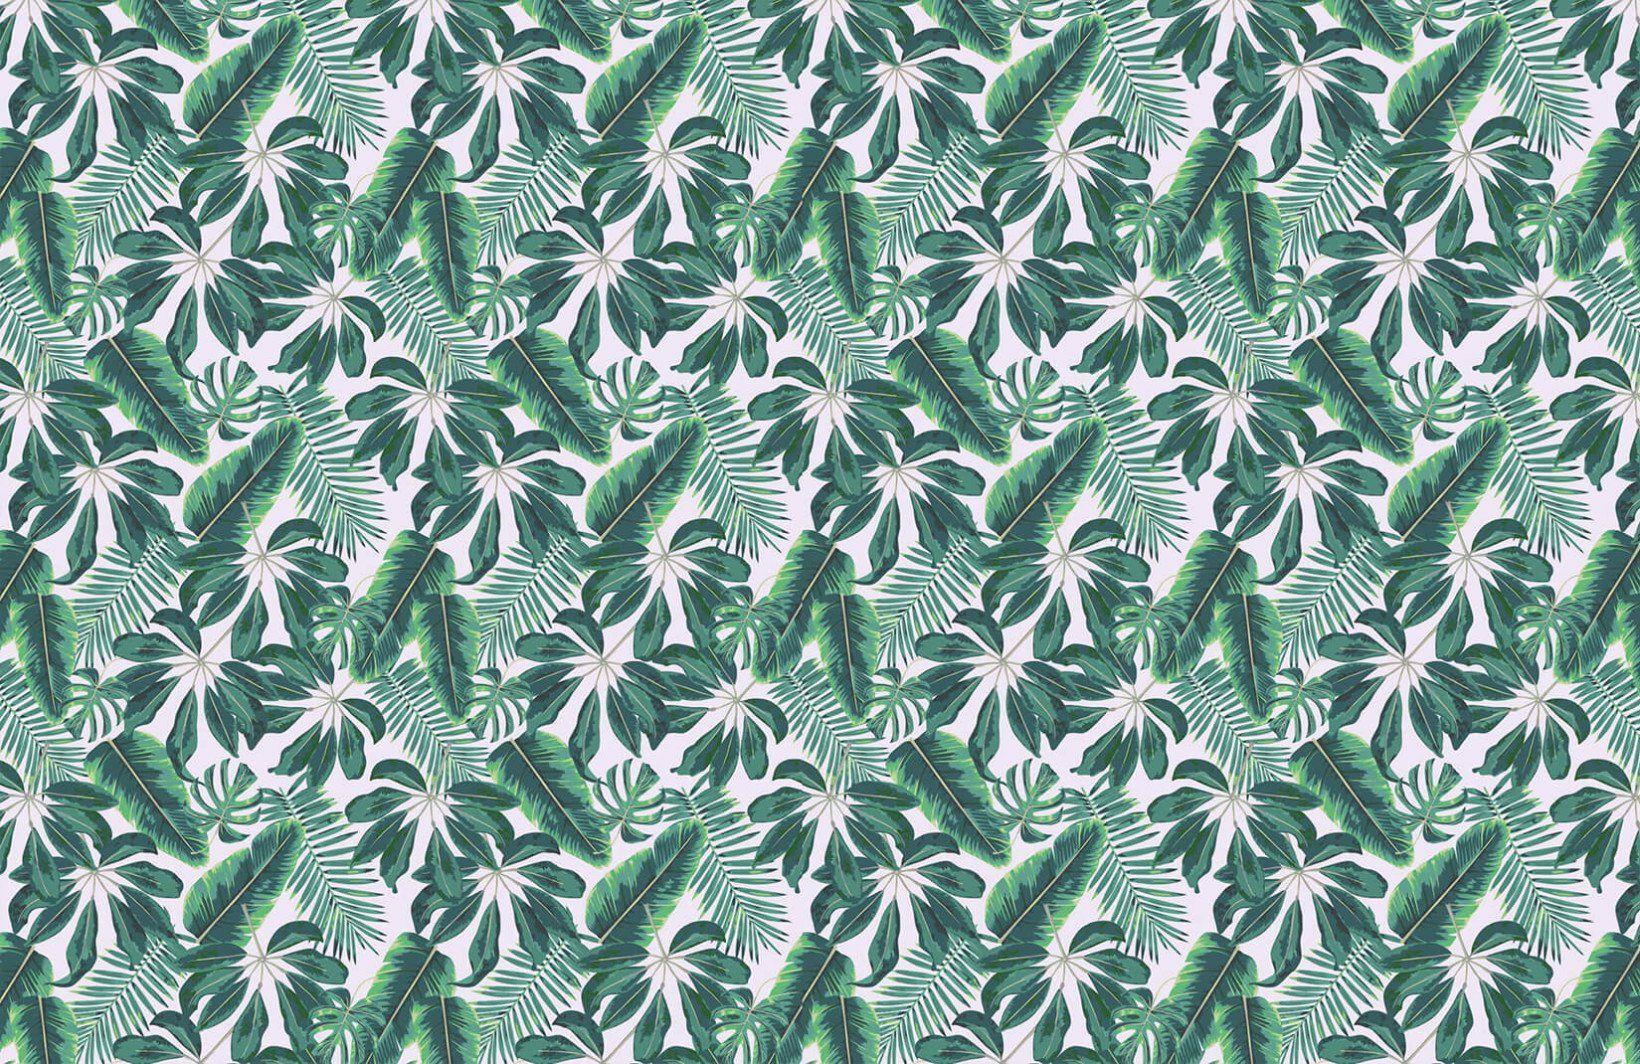 Mixed Tropical Leaves Wallpaper Фотообои, Обои и Интерьер